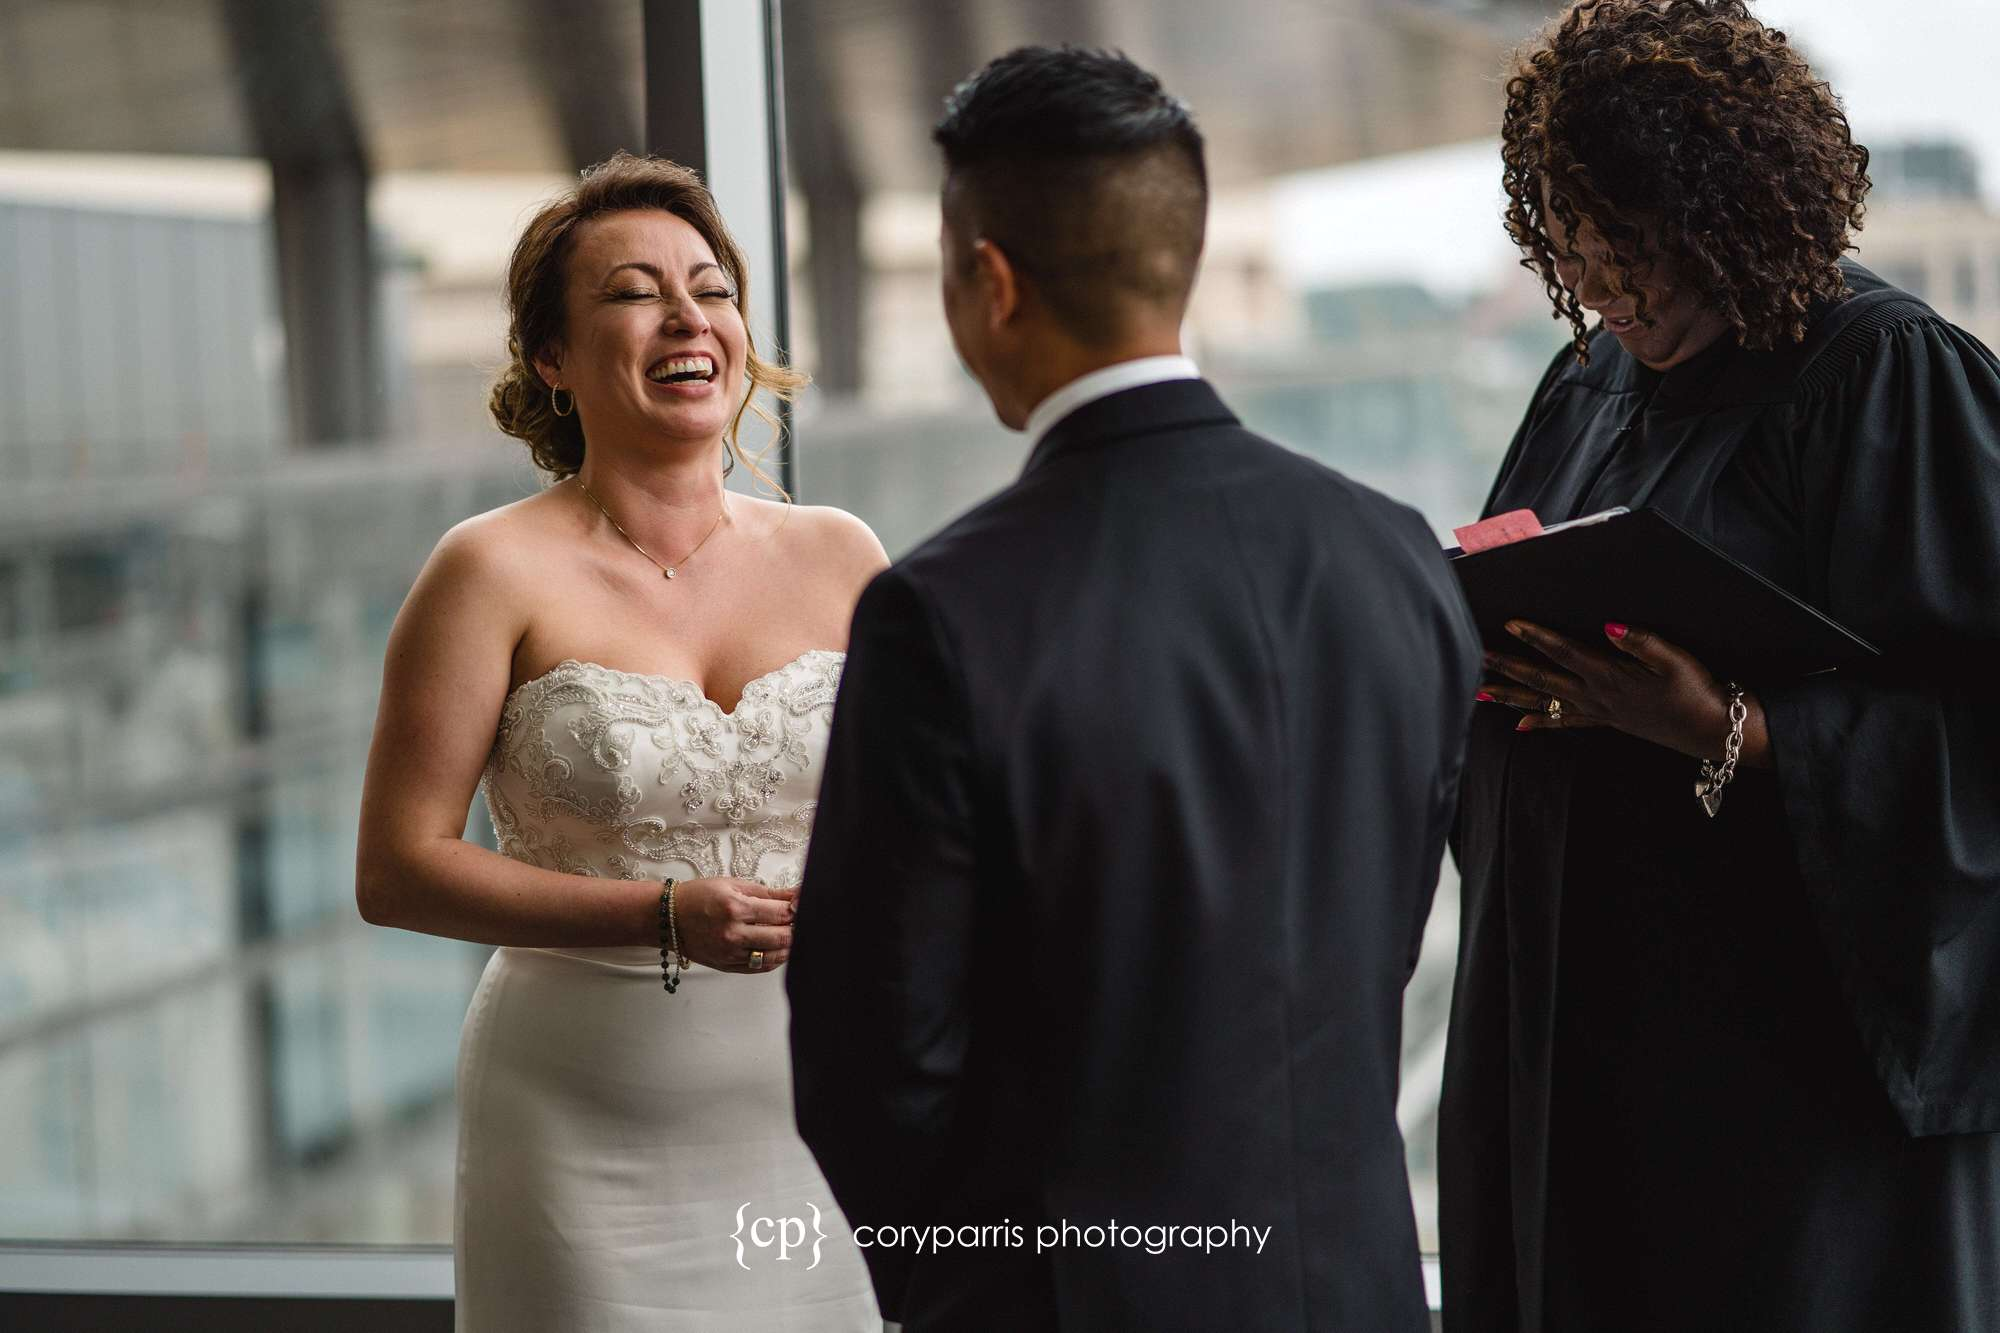 309-seattle-courthouse-wedding-photography.jpg